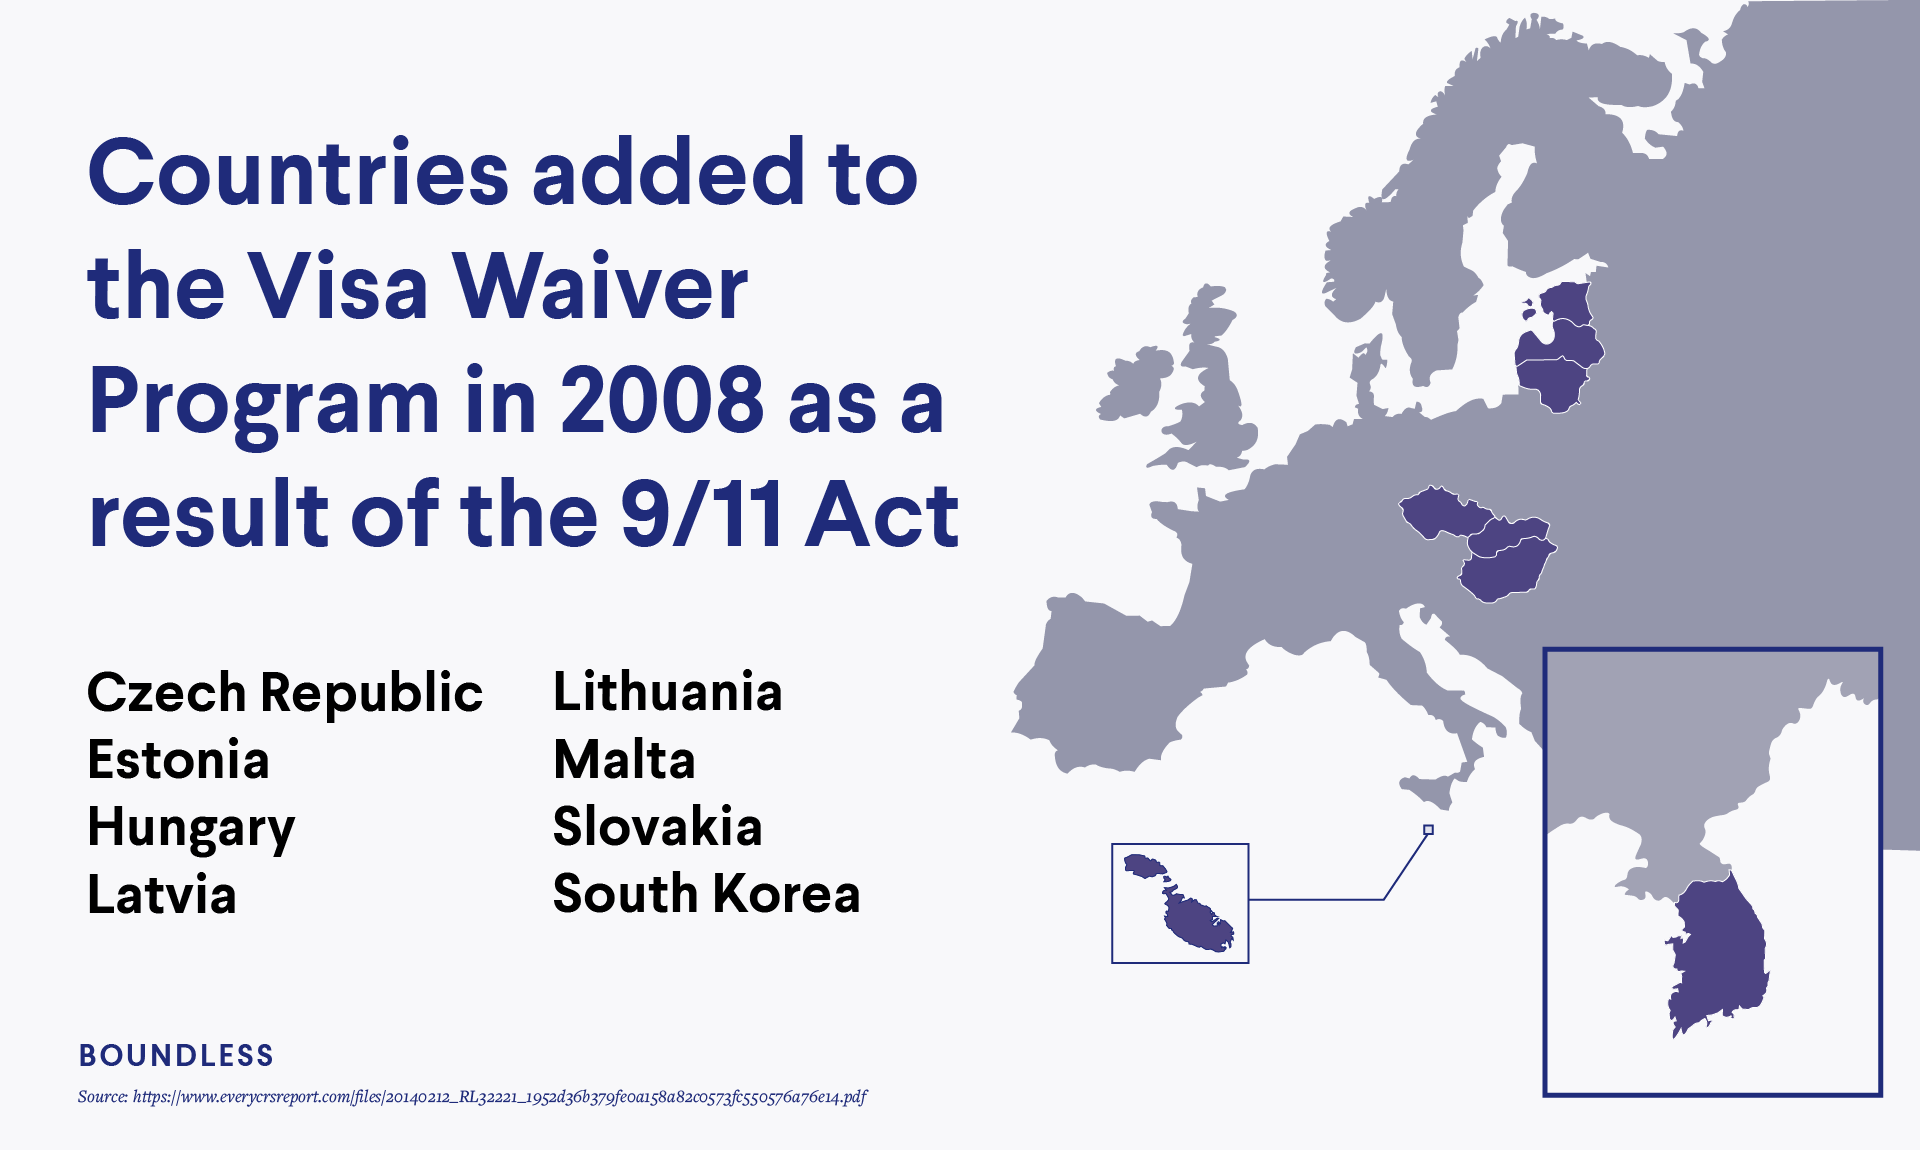 9/11 Visa Waiver Program